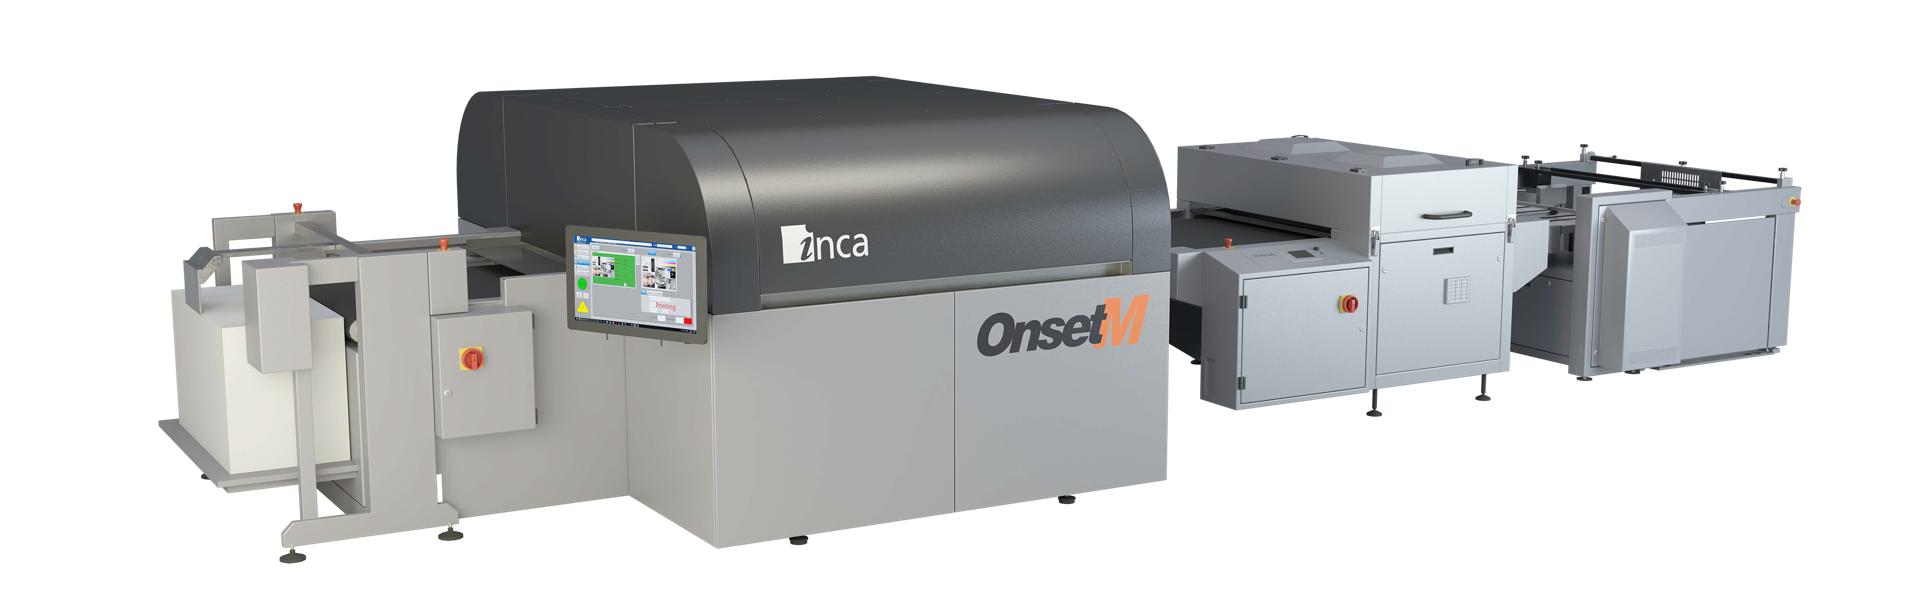 Imprimante Onset-M